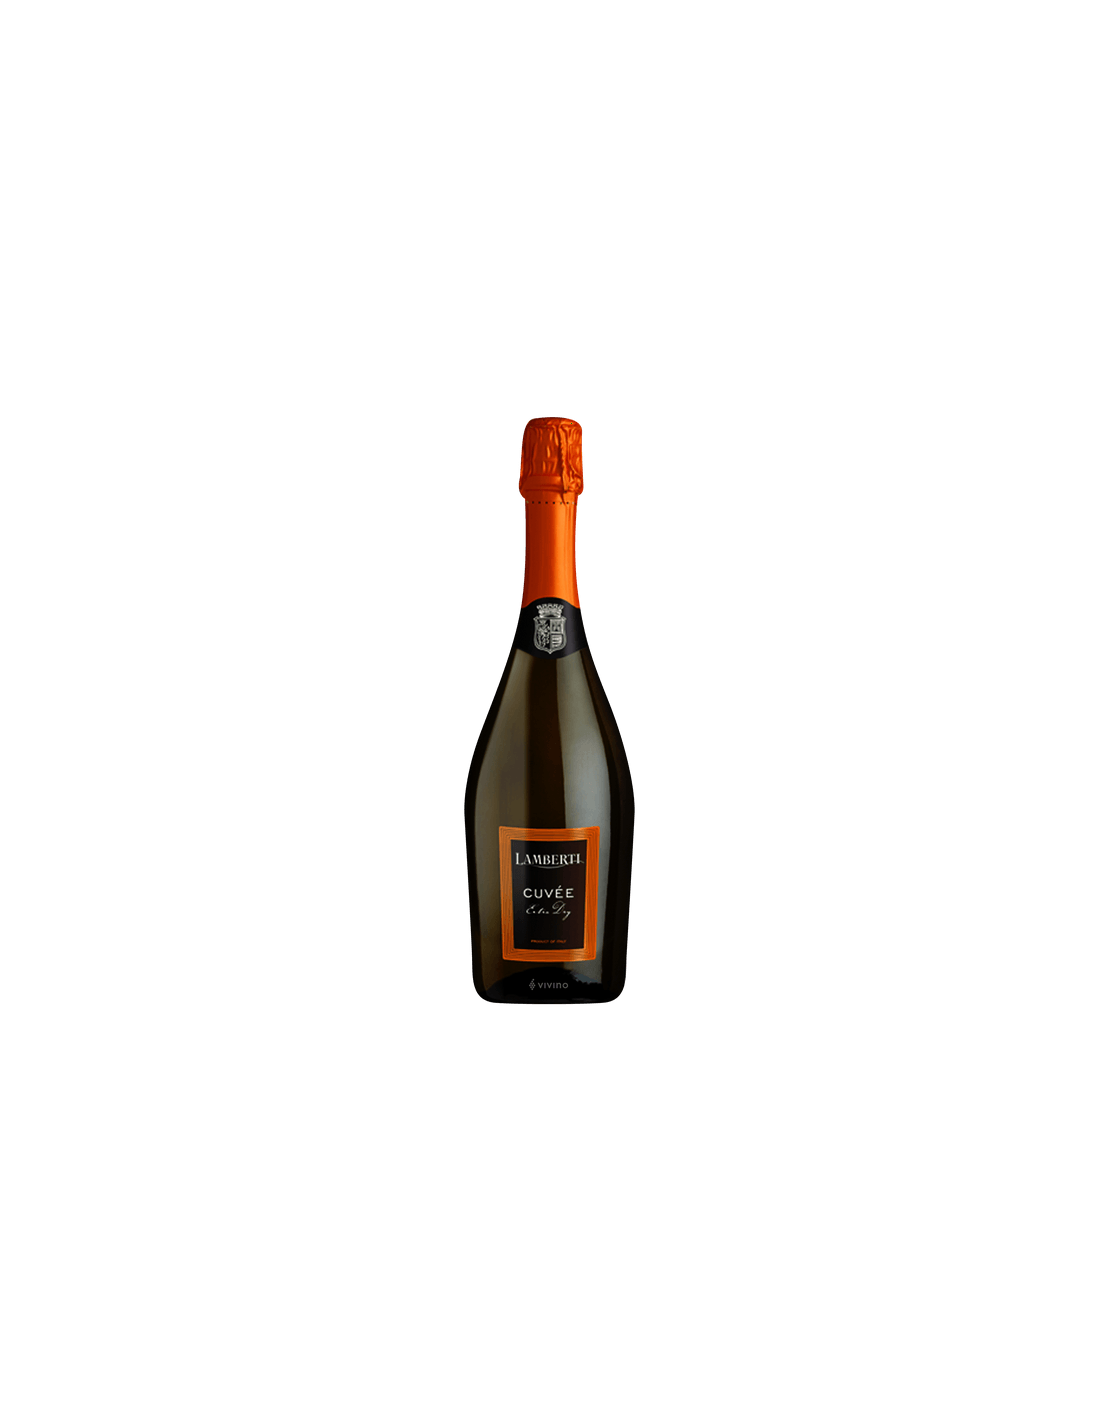 Vin spumant Lamberti Cuvée Extra Dry, 12% alc., 0.75L, Italia